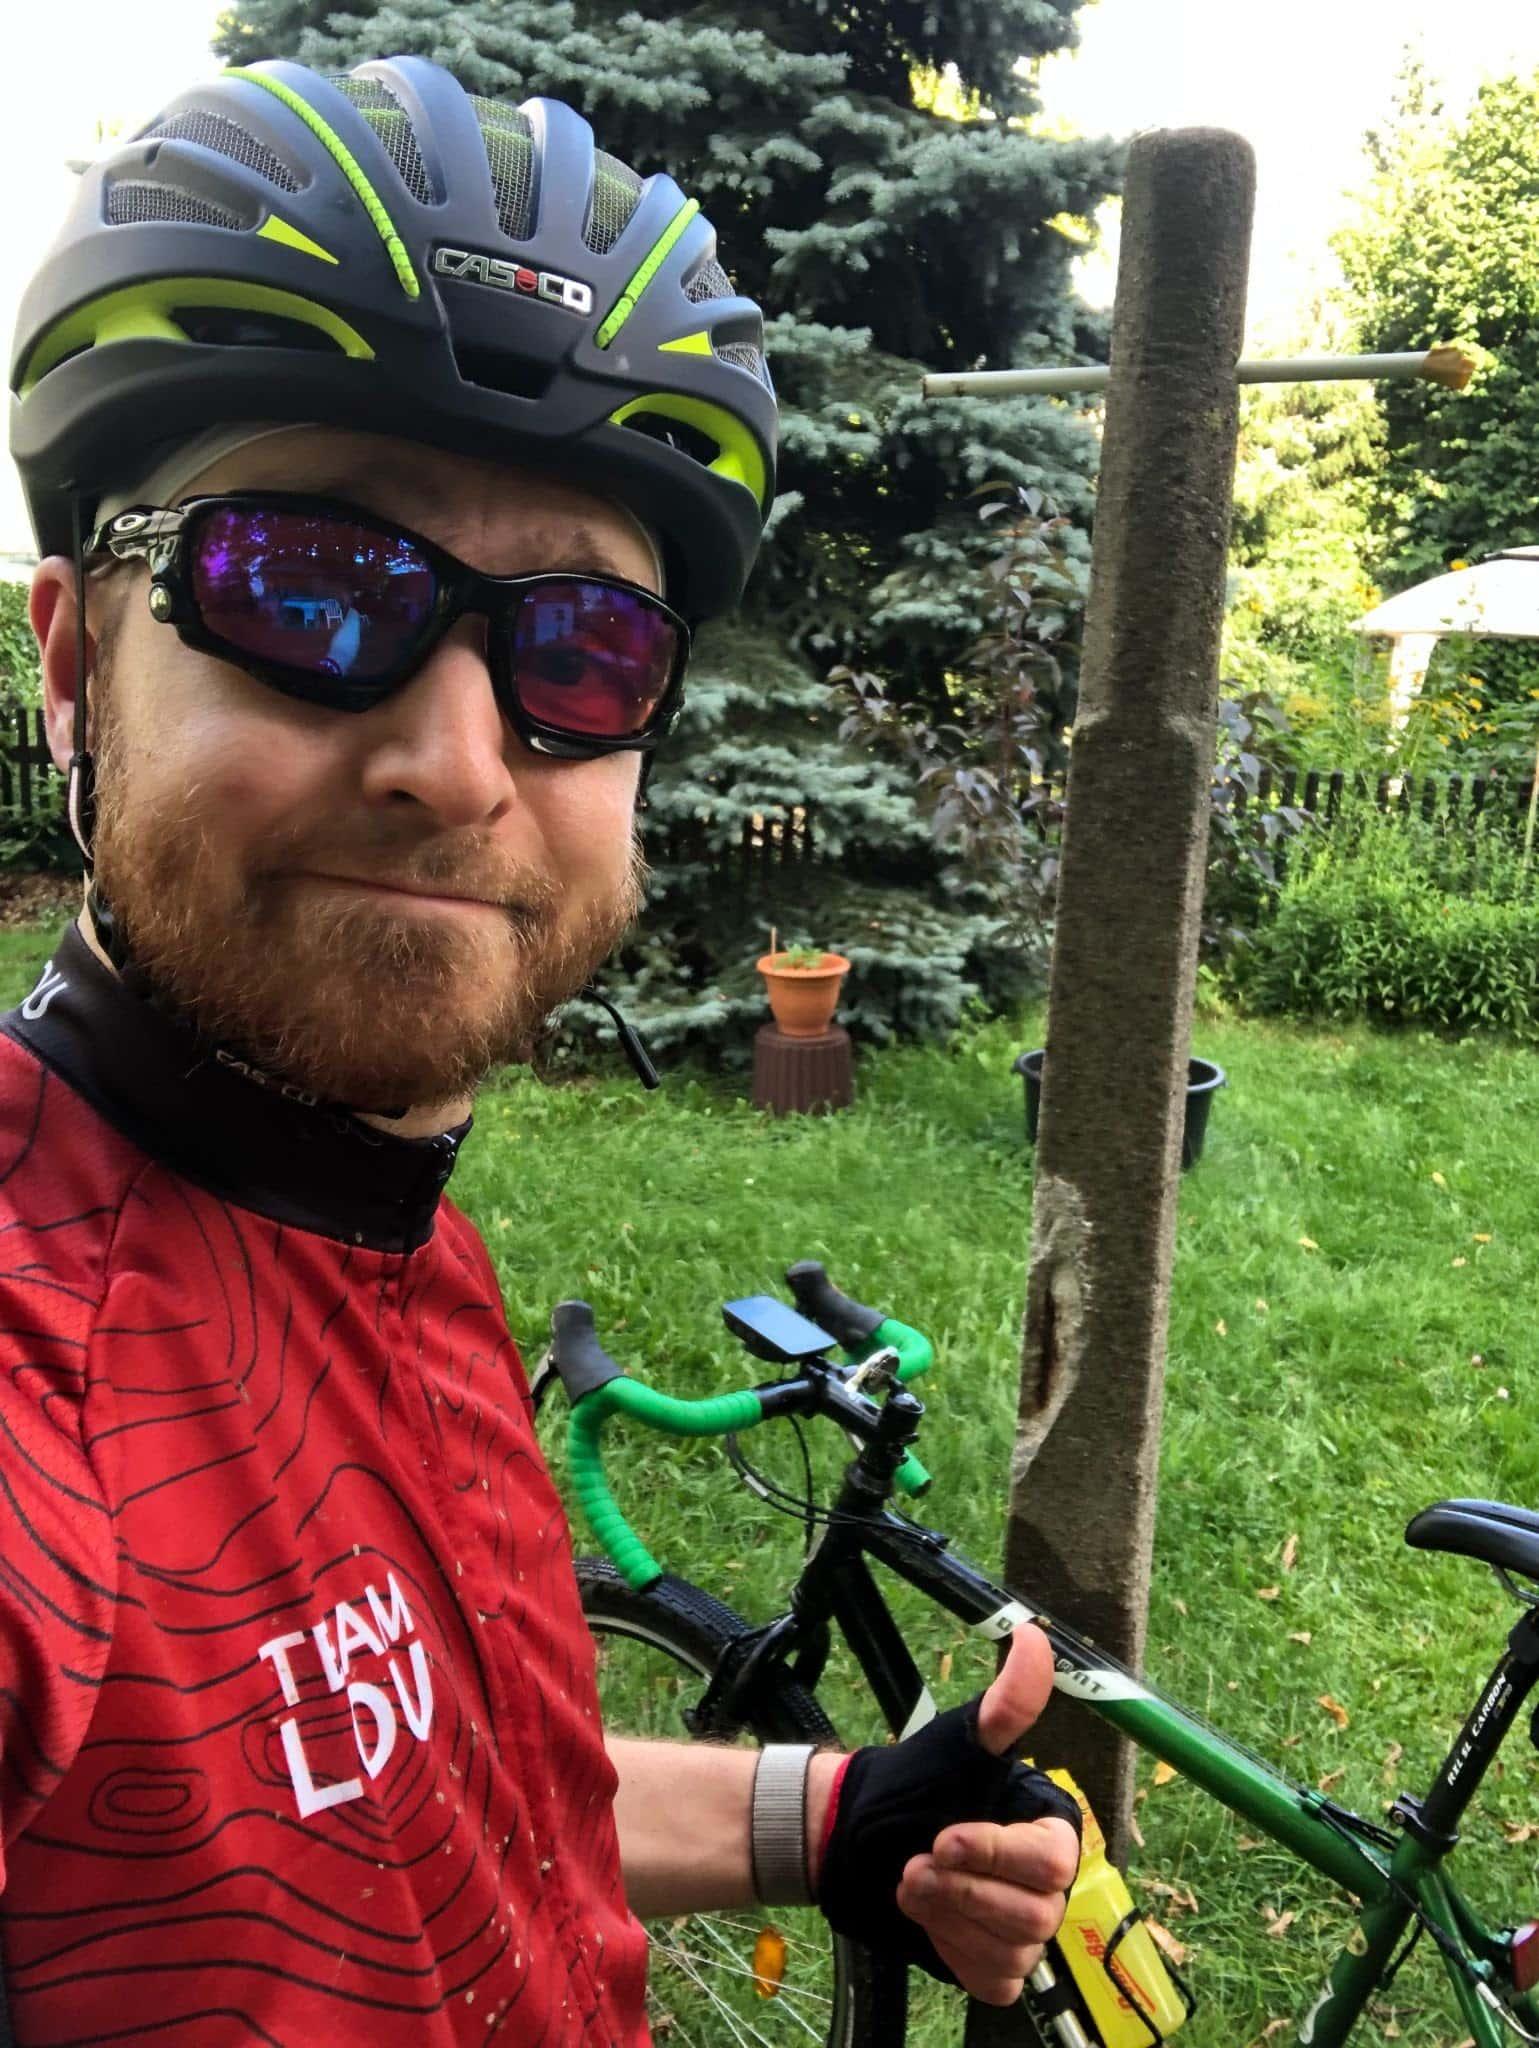 Falk with his bike